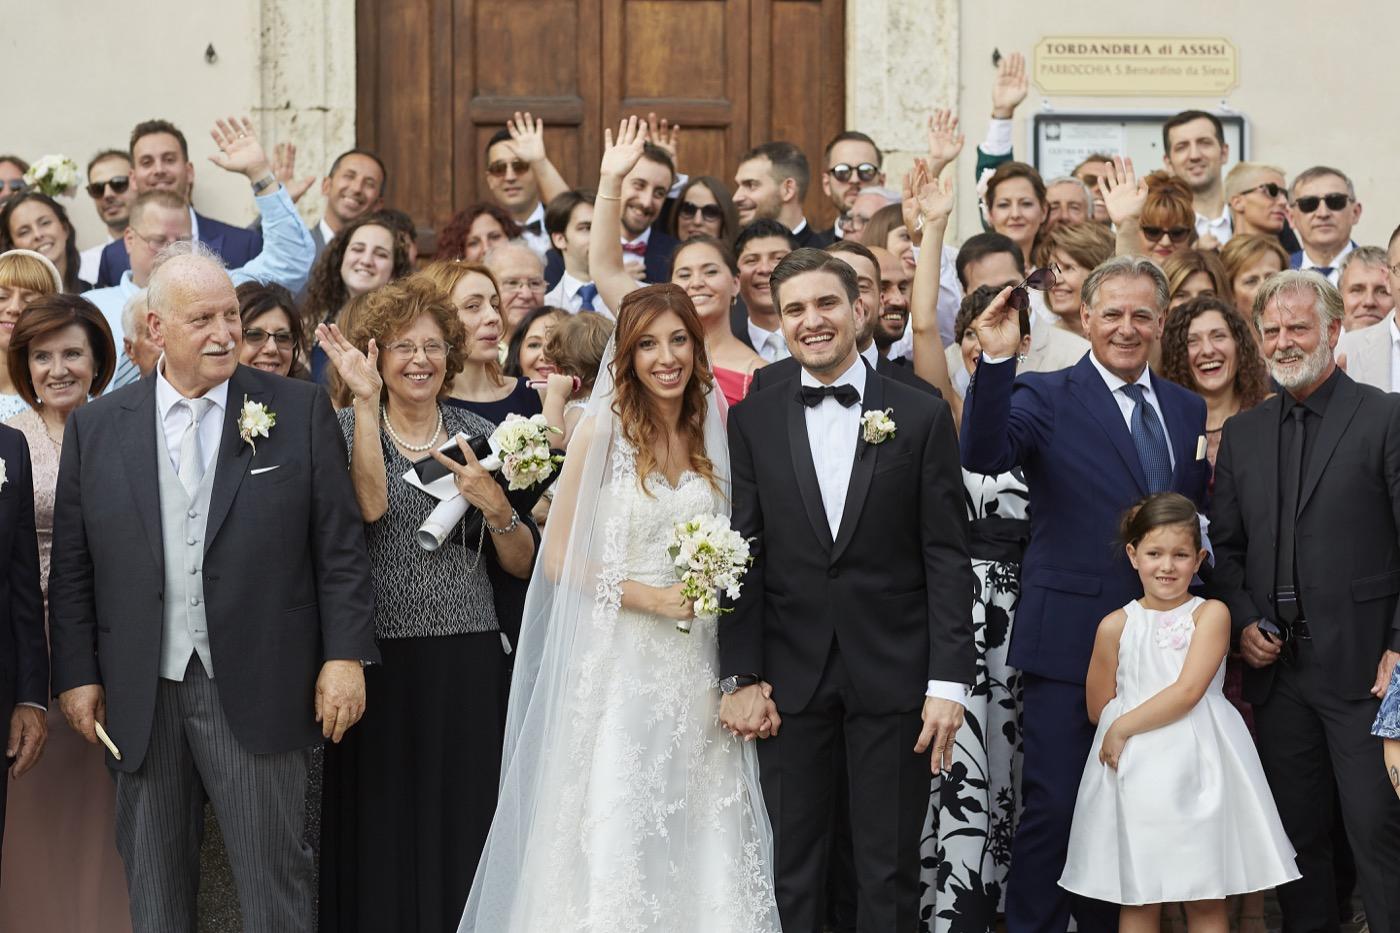 Claudio-Coppola-wedding-photographer-abbazia-7-frati-piegaro-60